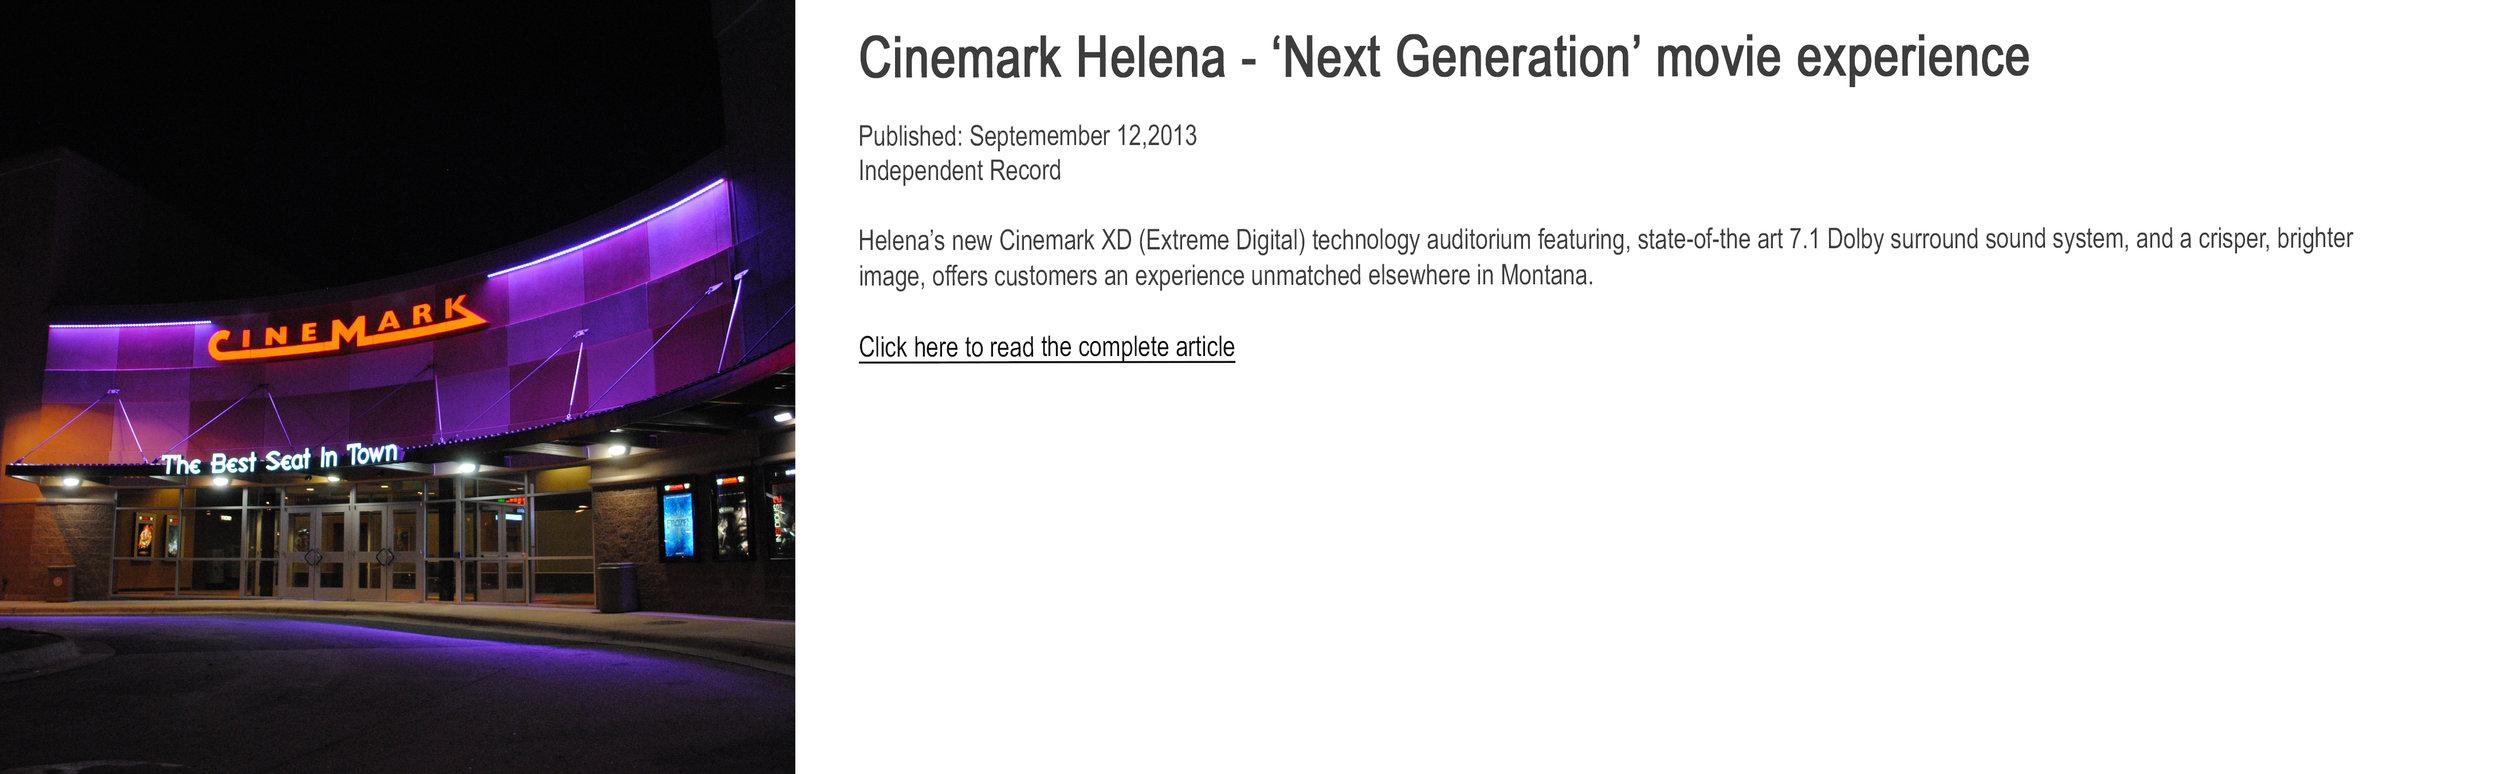 Cinemark Helena.jpg